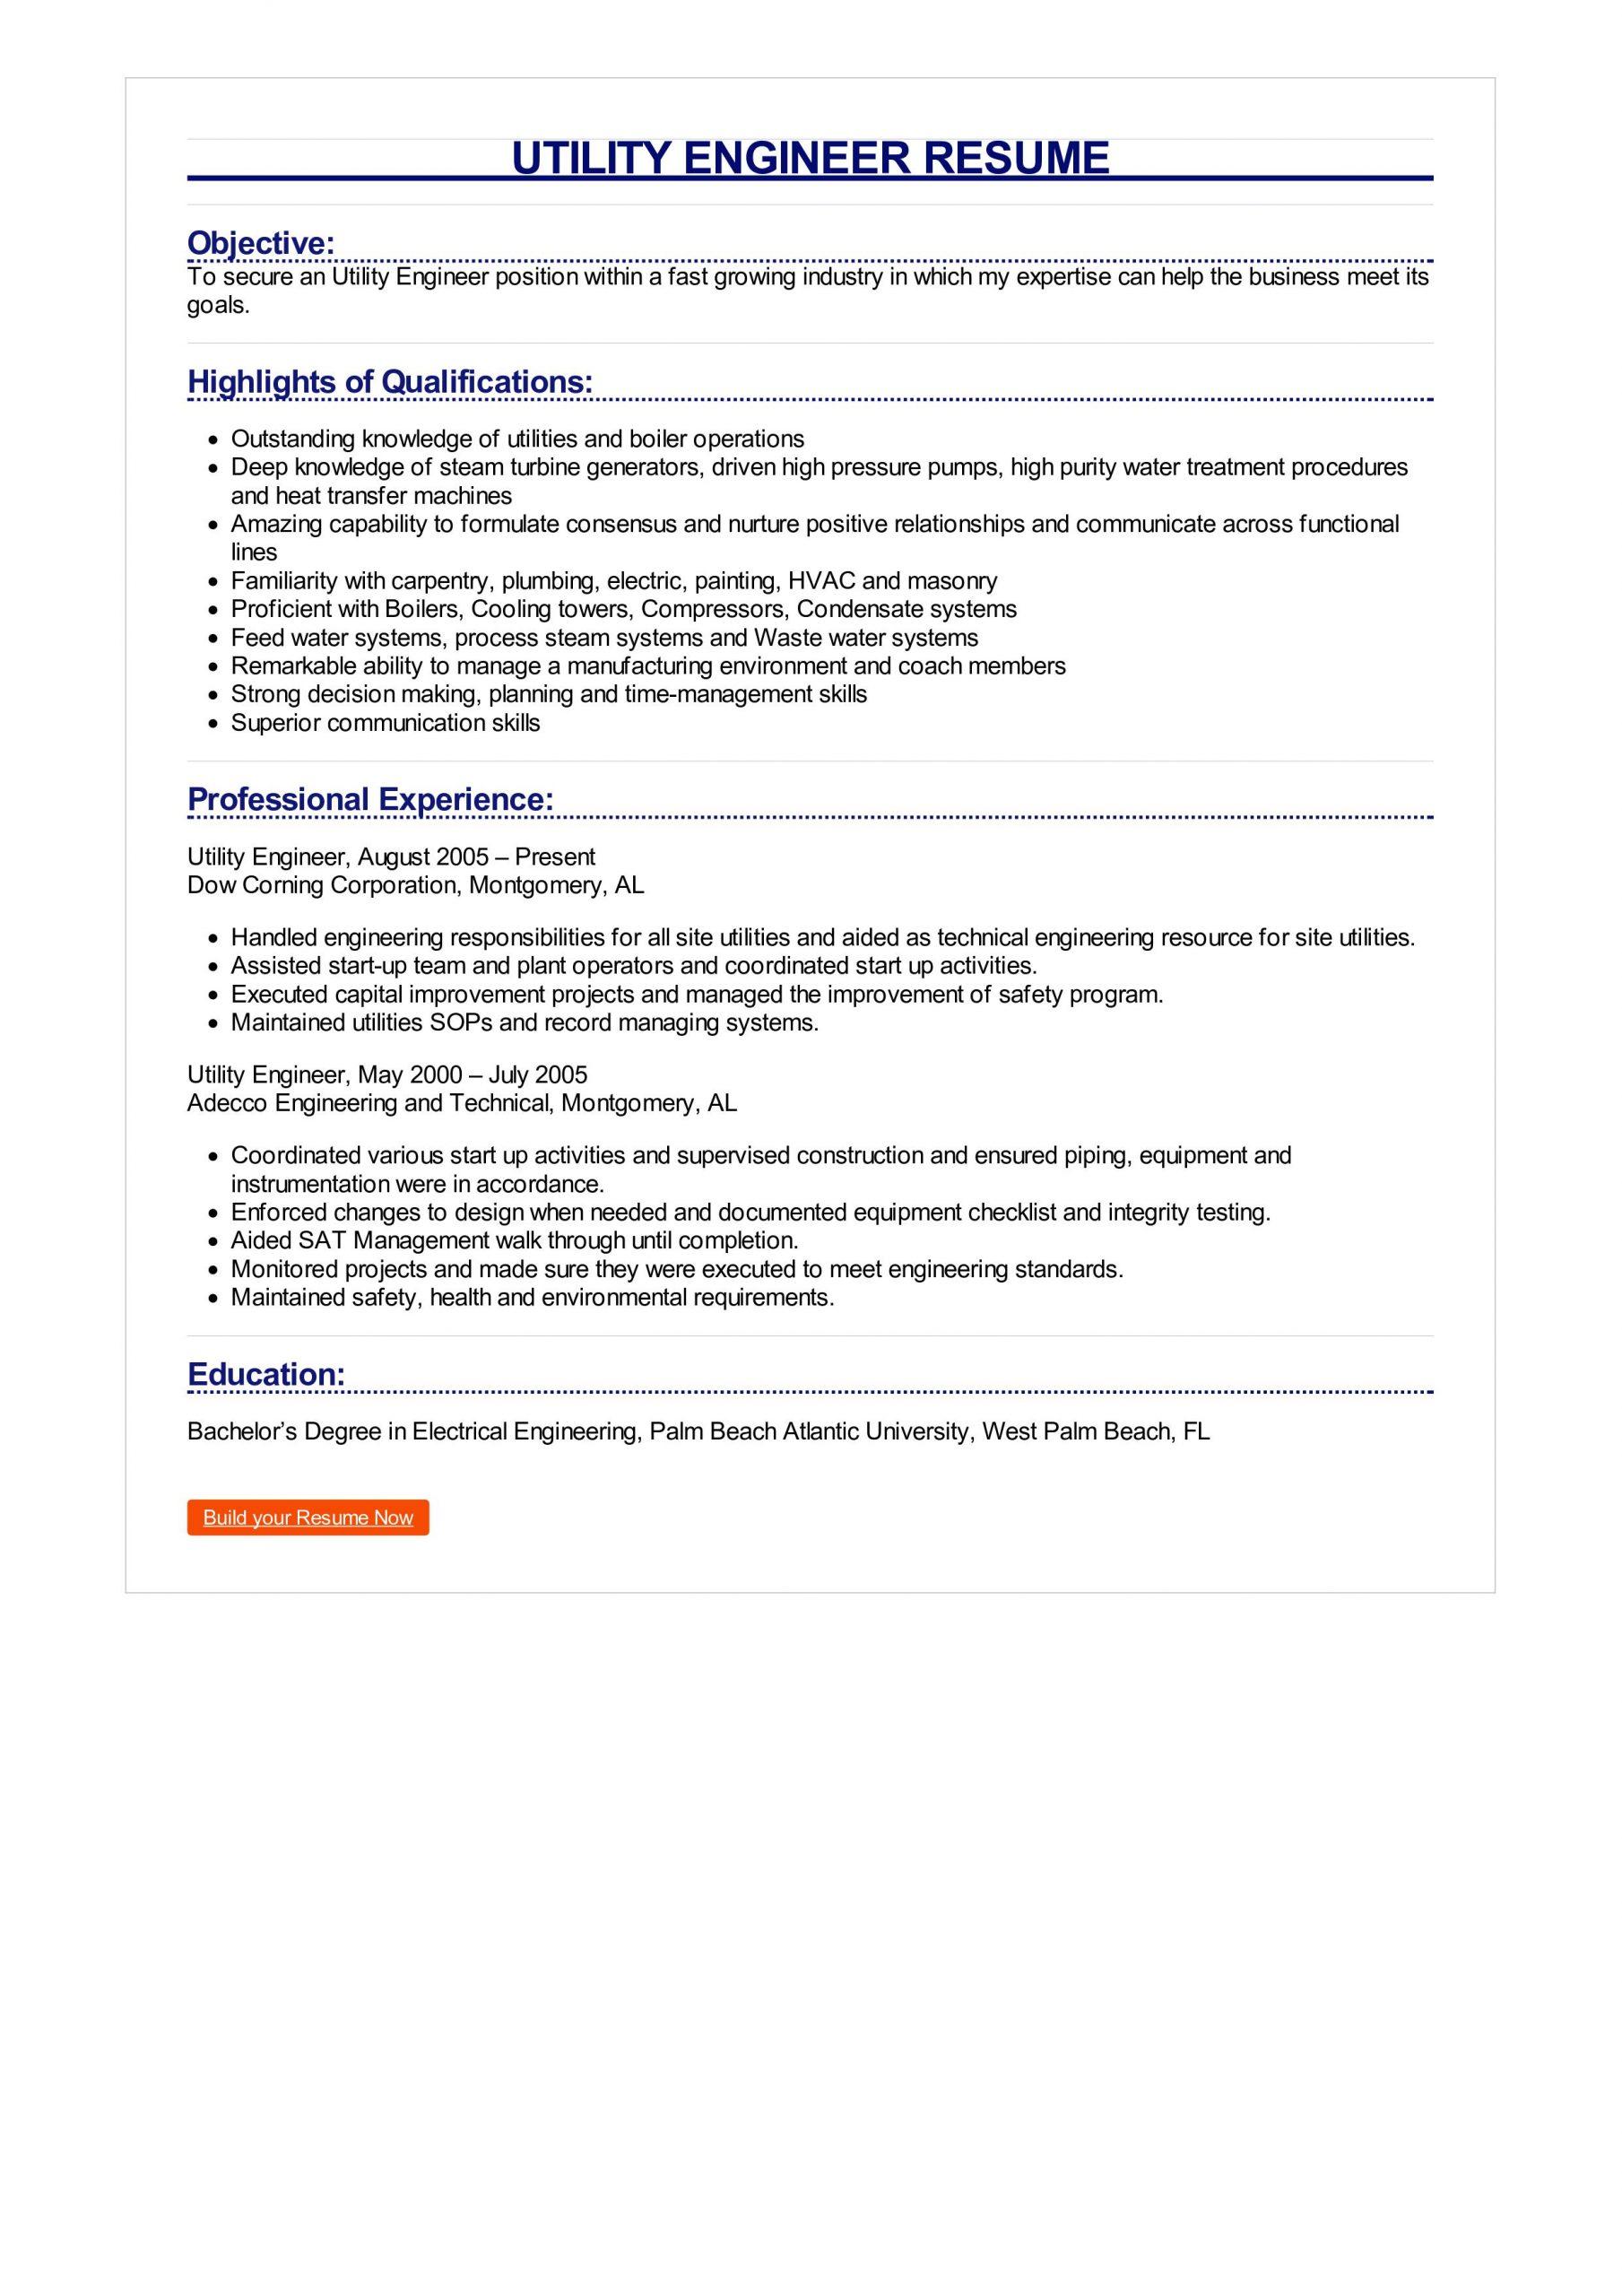 Utility Engineer Resume